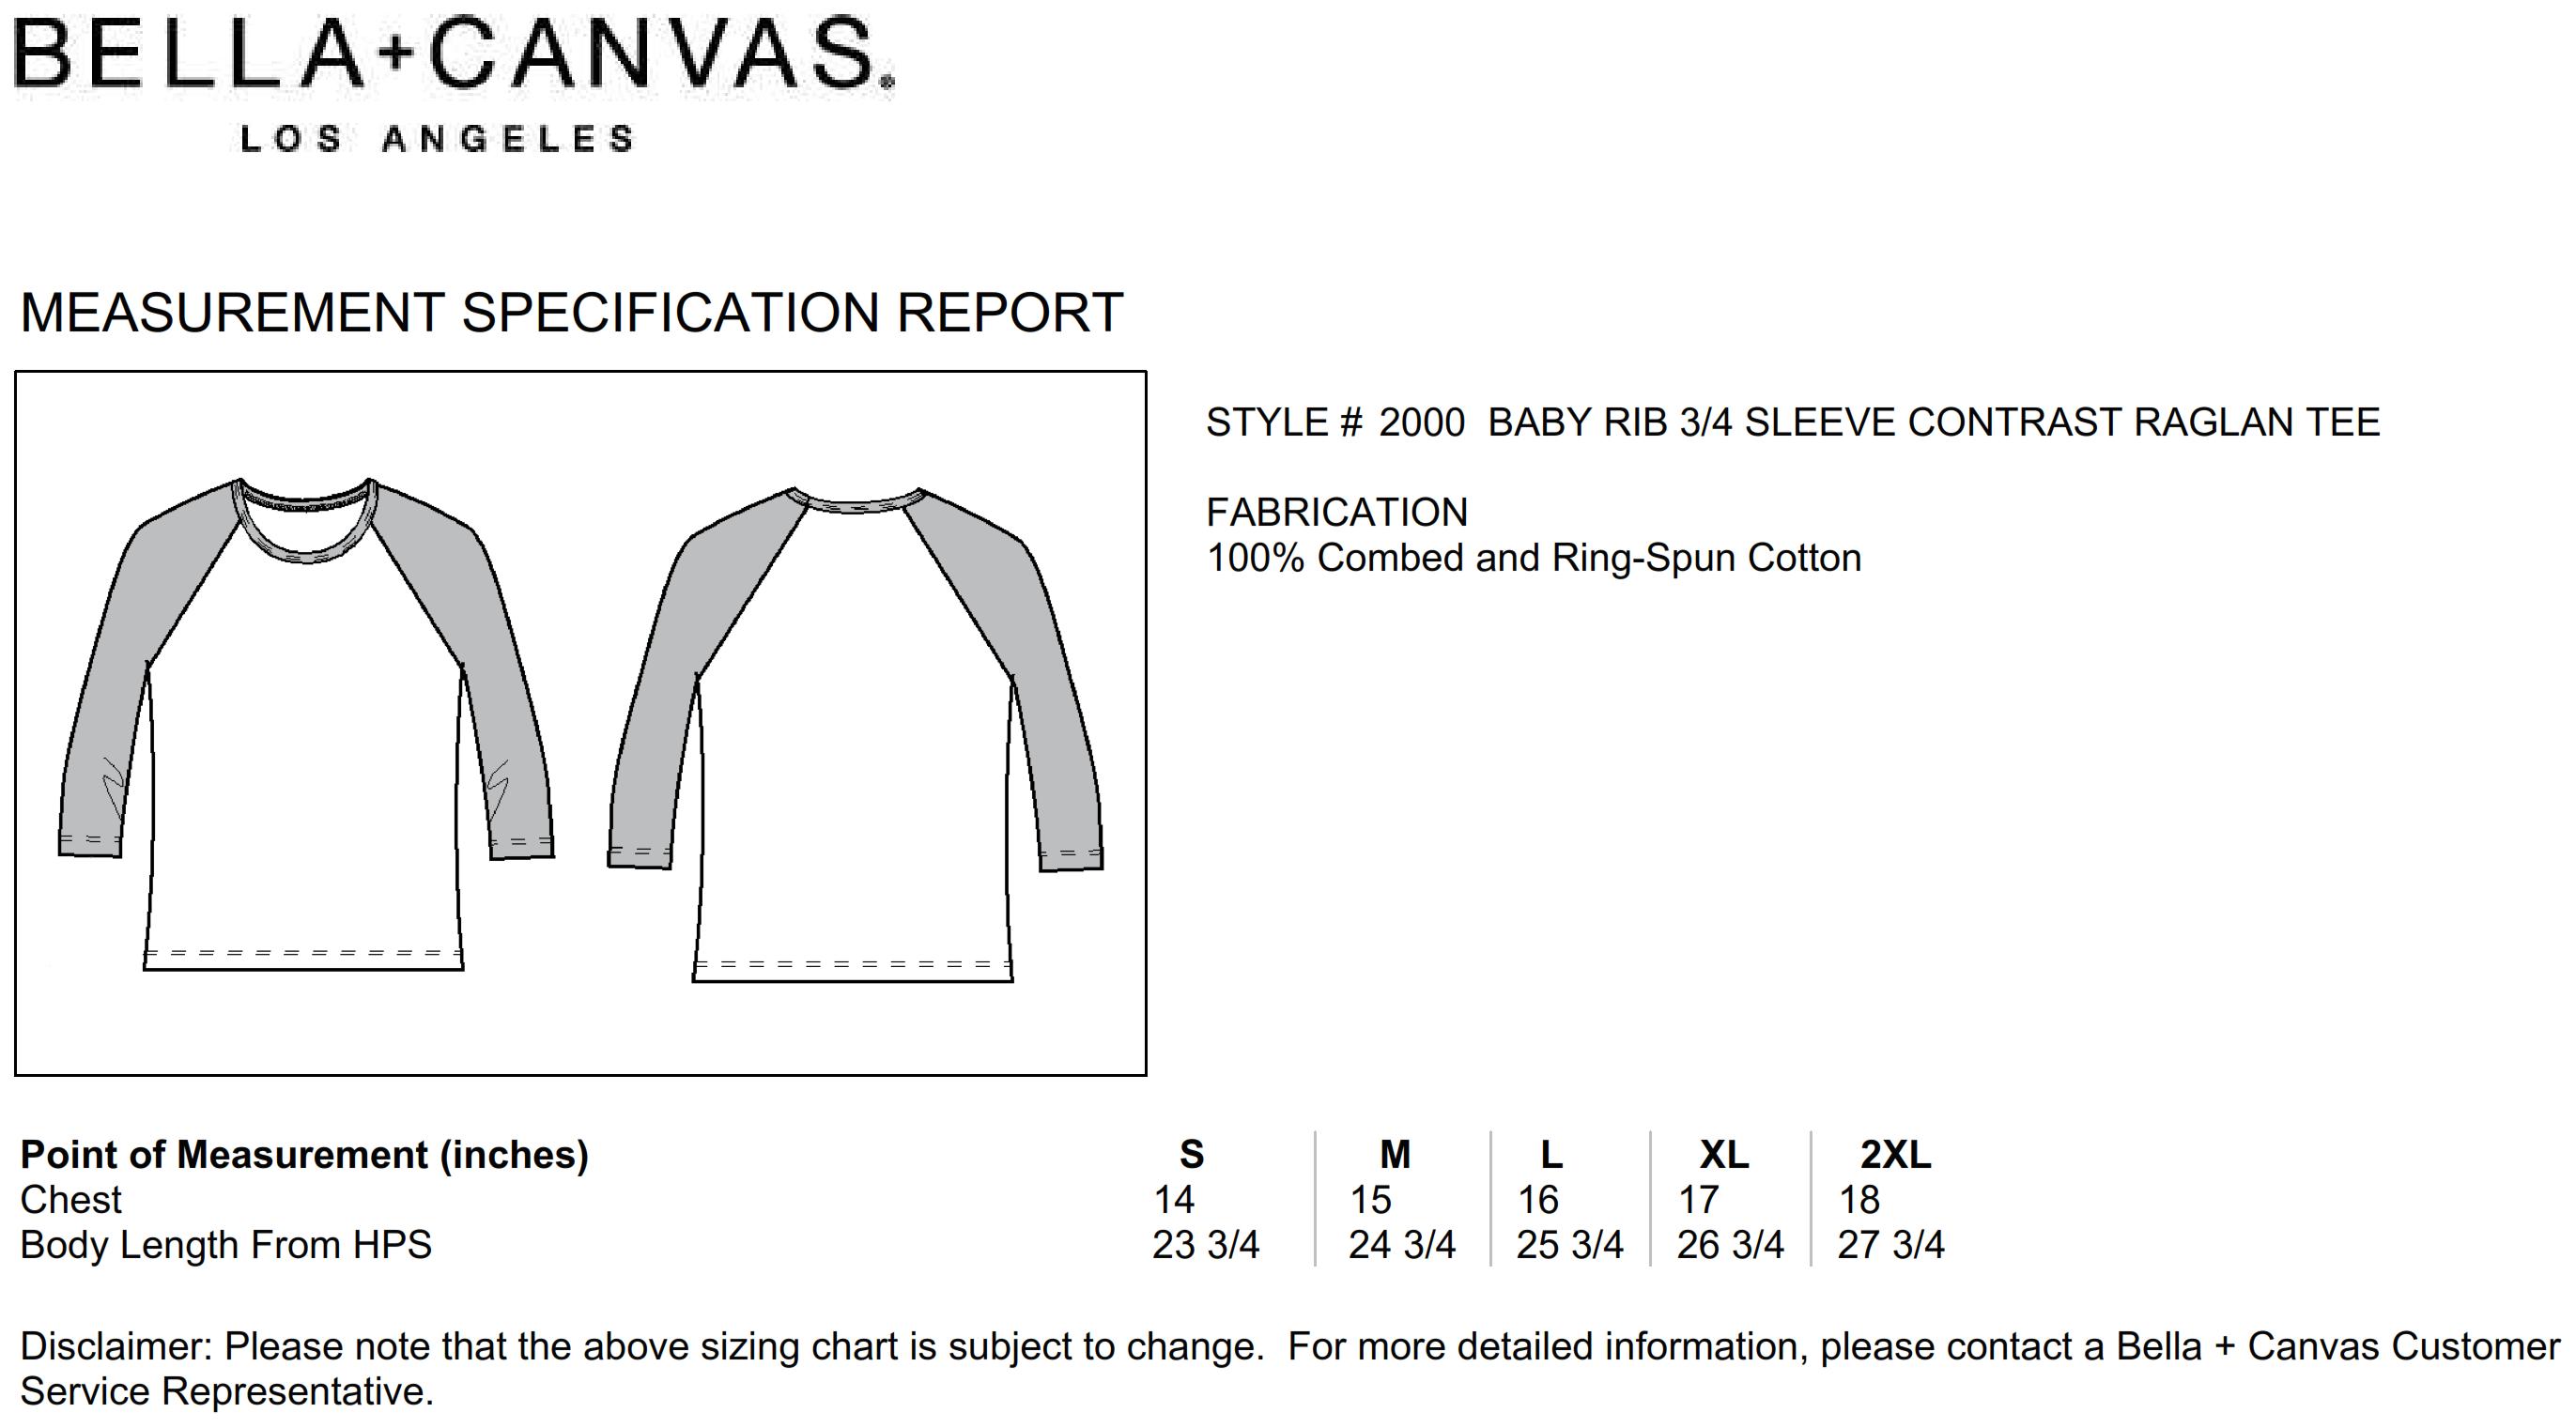 Bella+Canvas: 3/4 Sleeve Contrast Raglan T-Shirt 2000:00:00